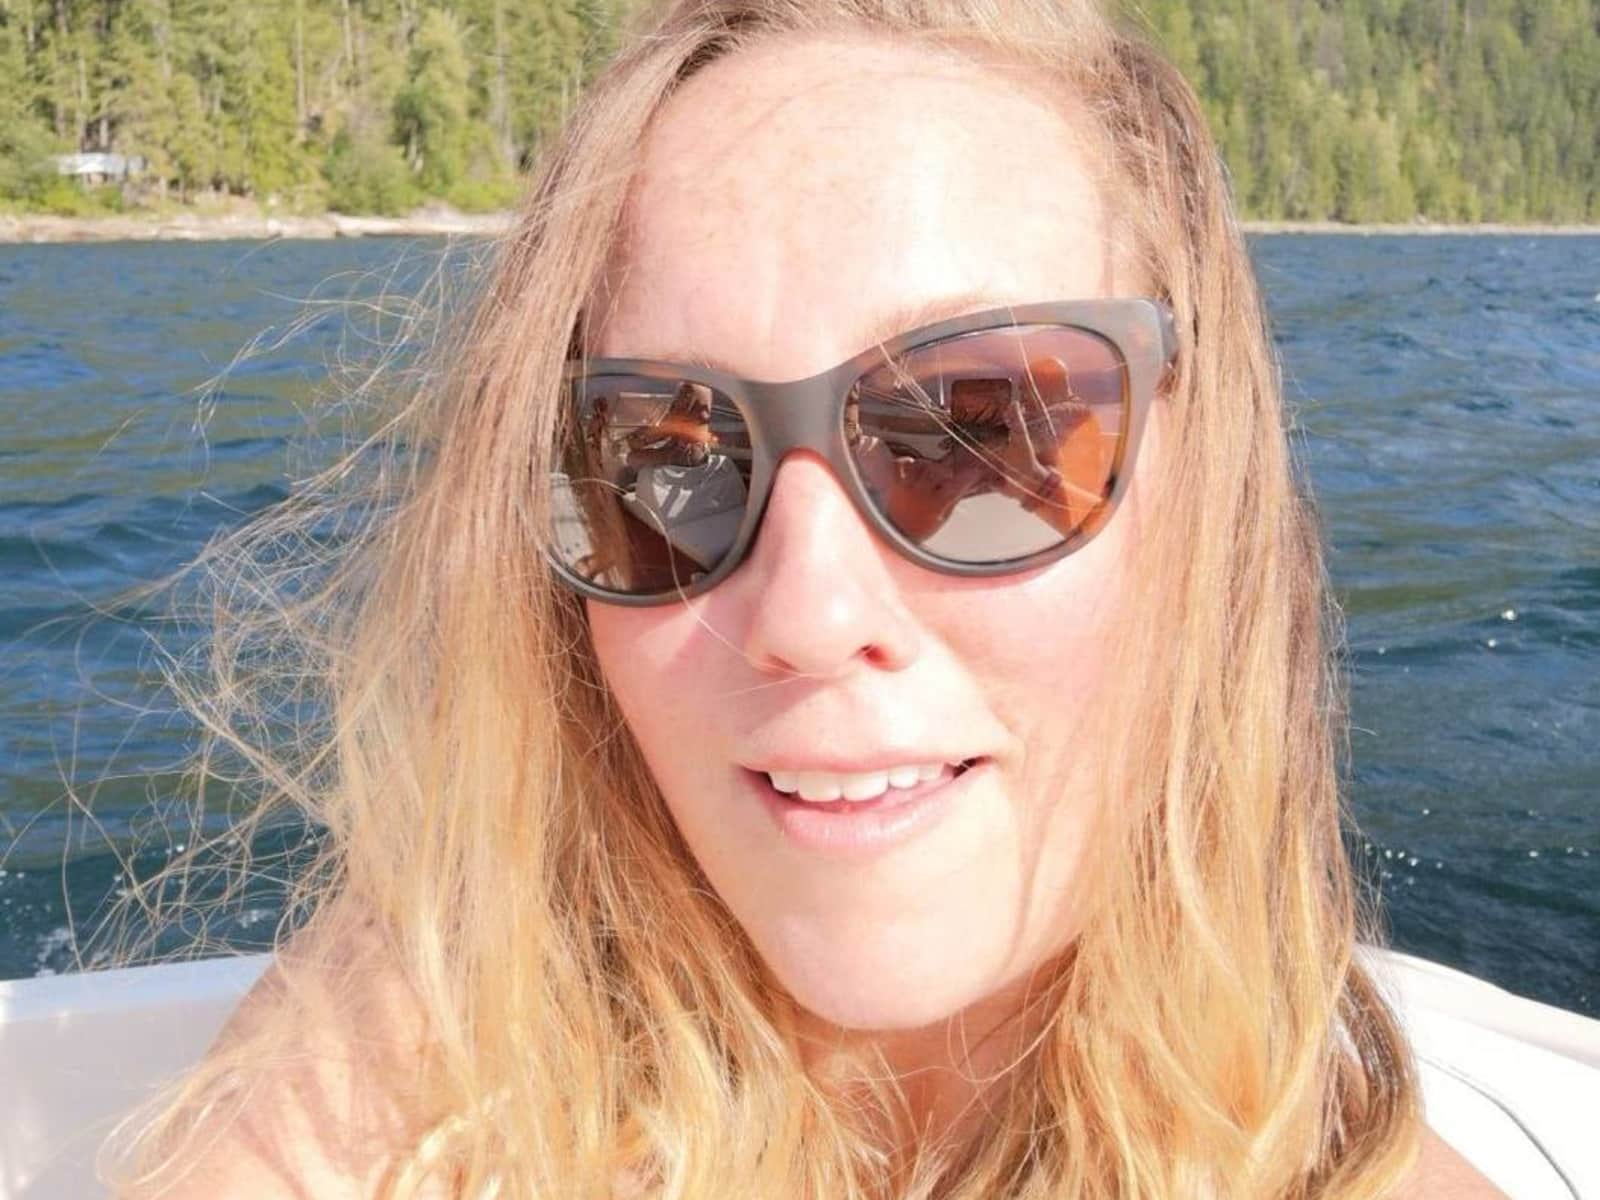 Danielle from Slocan, British Columbia, Canada